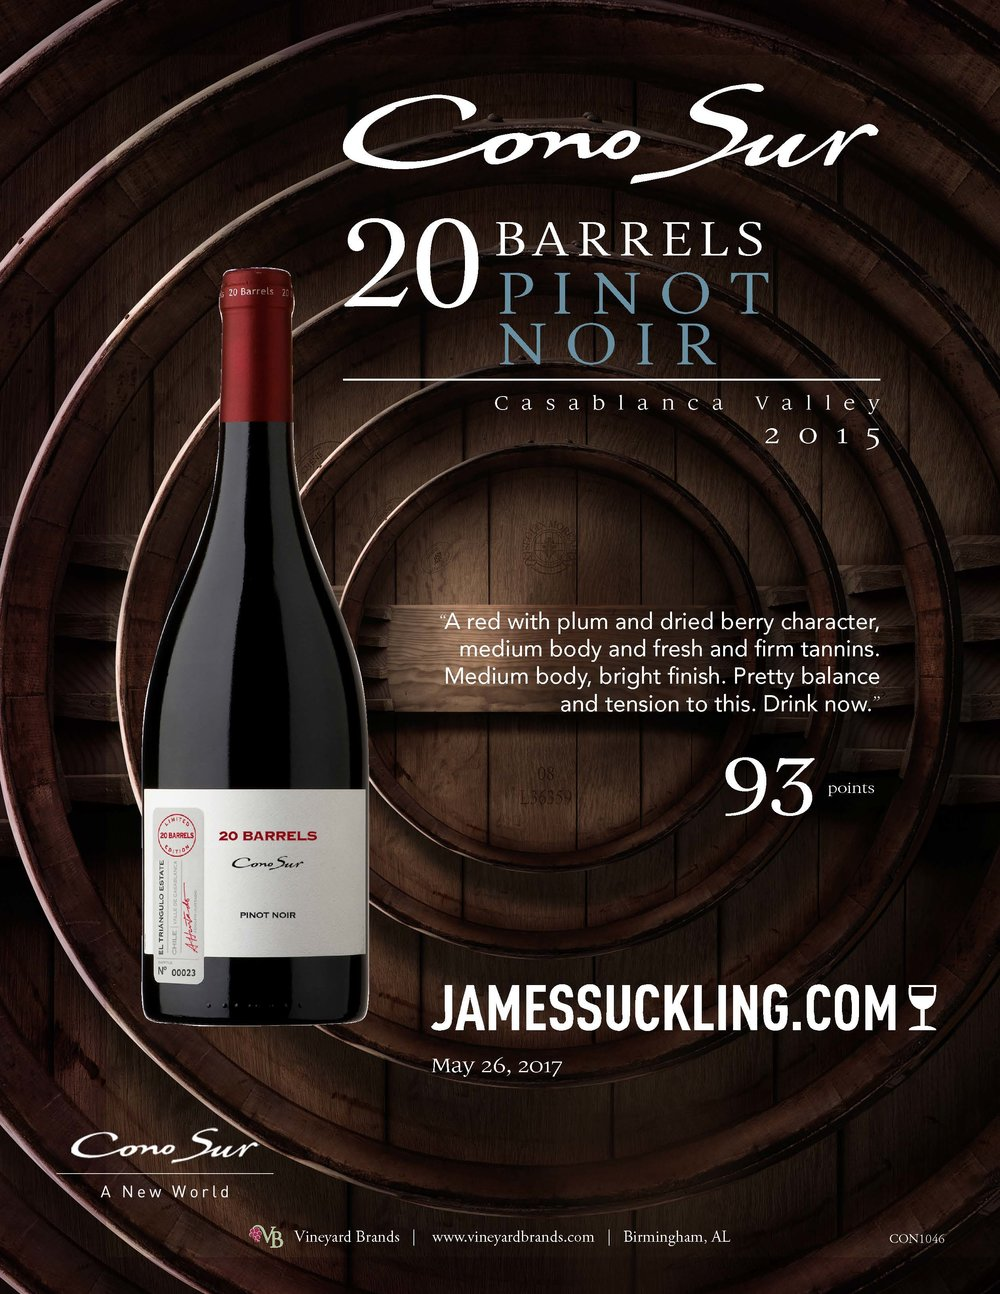 Cono Sur 20 Barrels Pinot Noir 2015.jpg